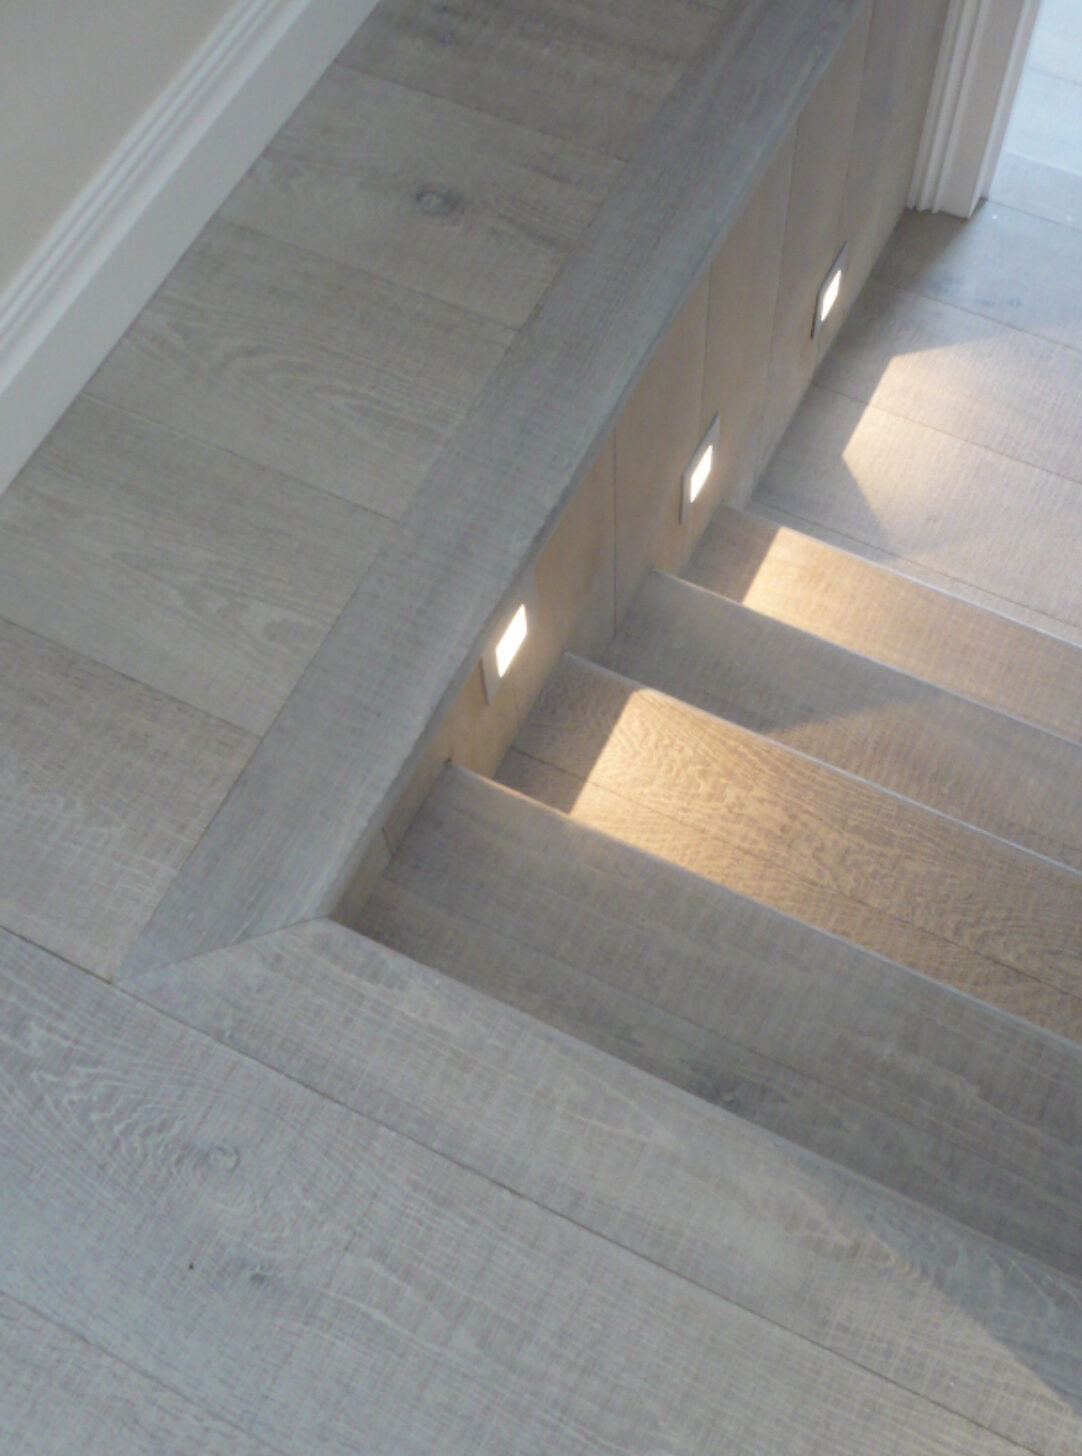 Installation Image 2